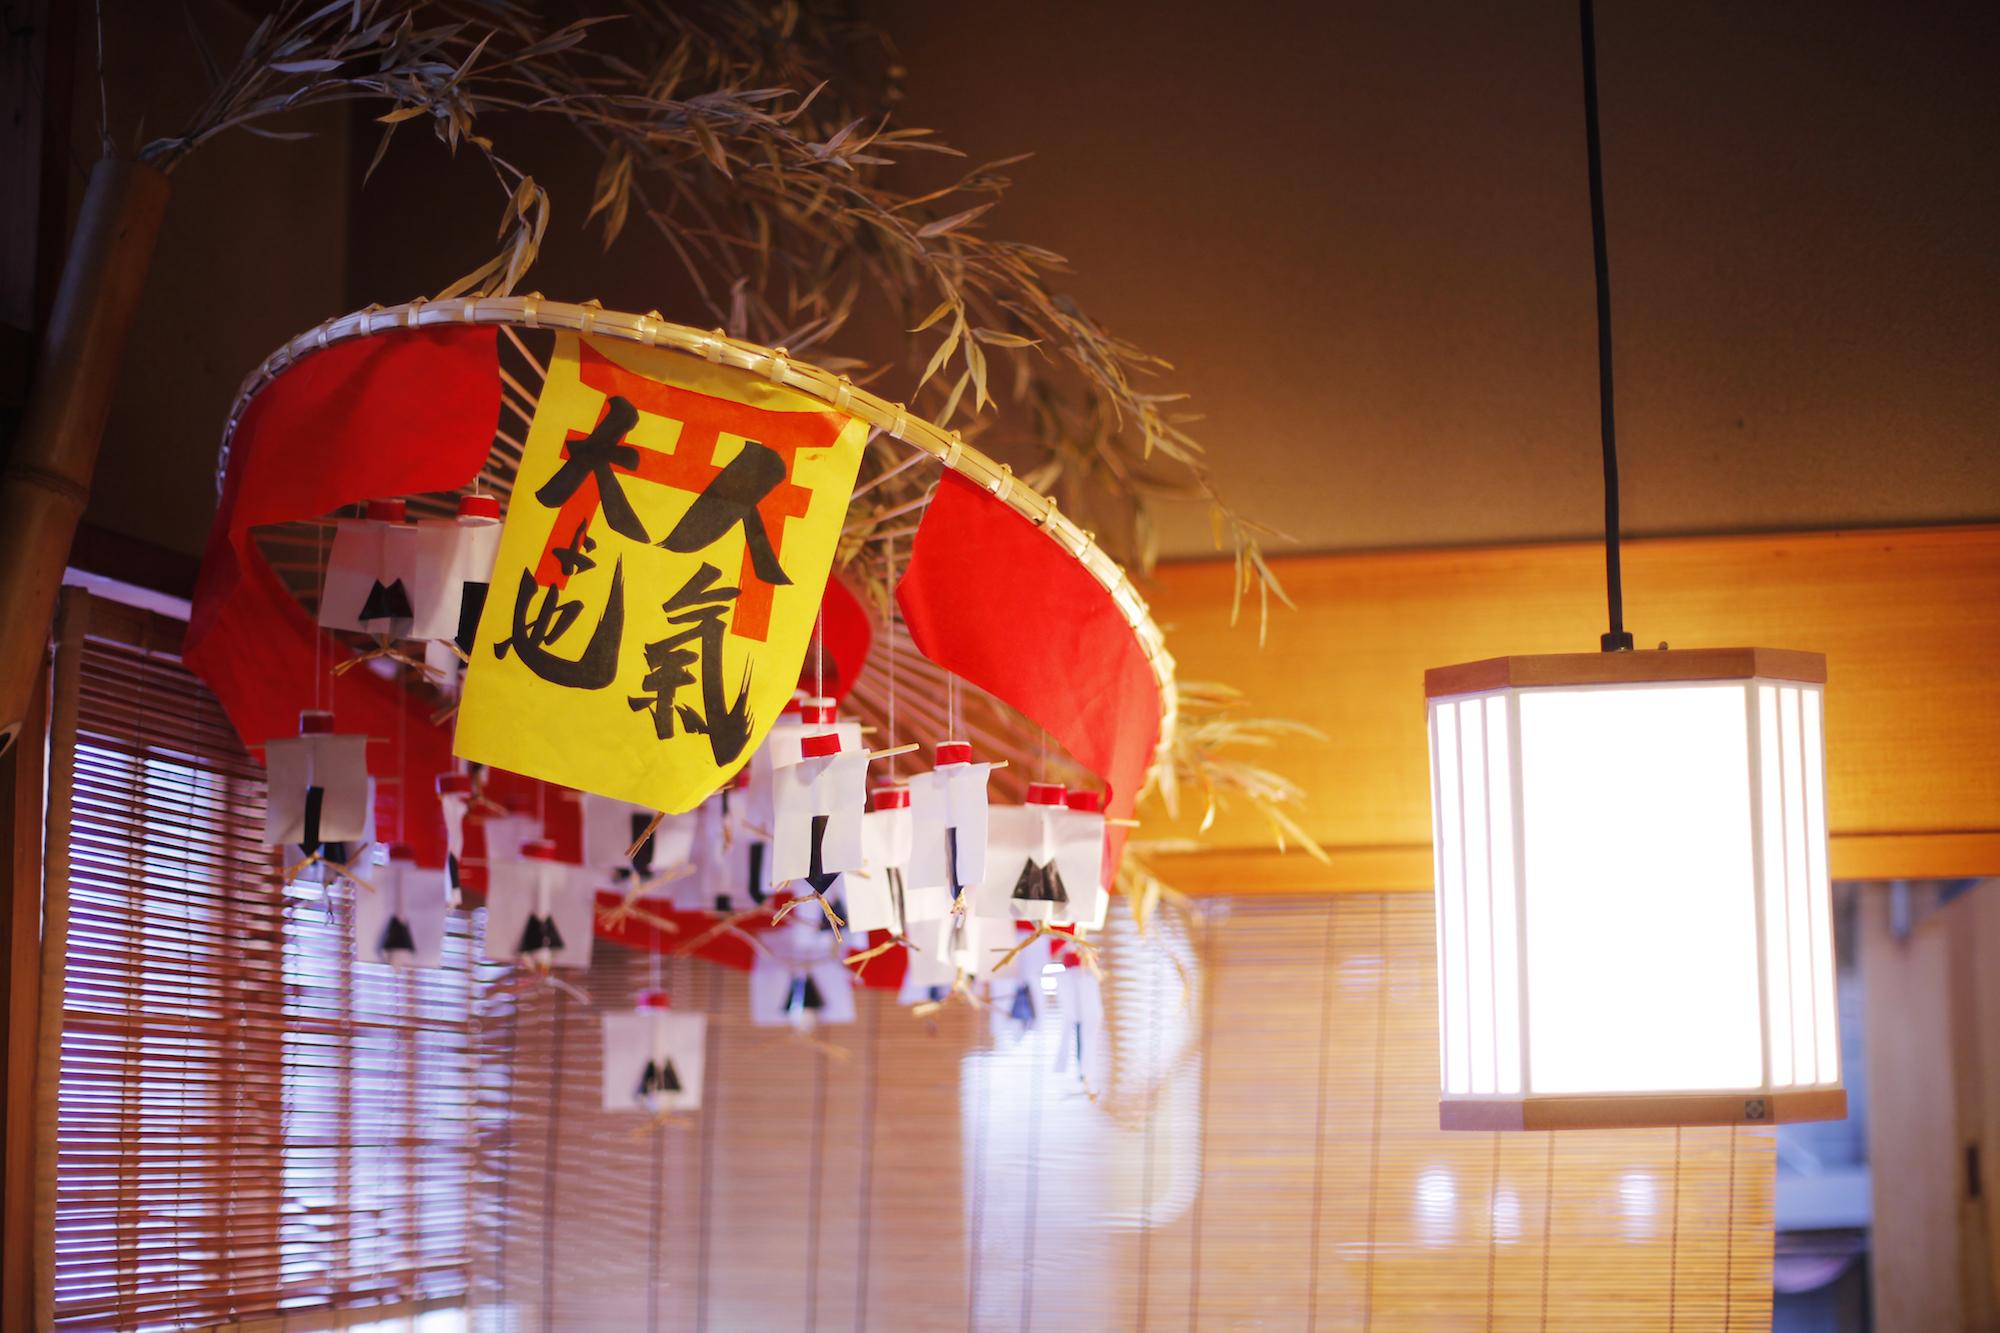 Kogetsu interior